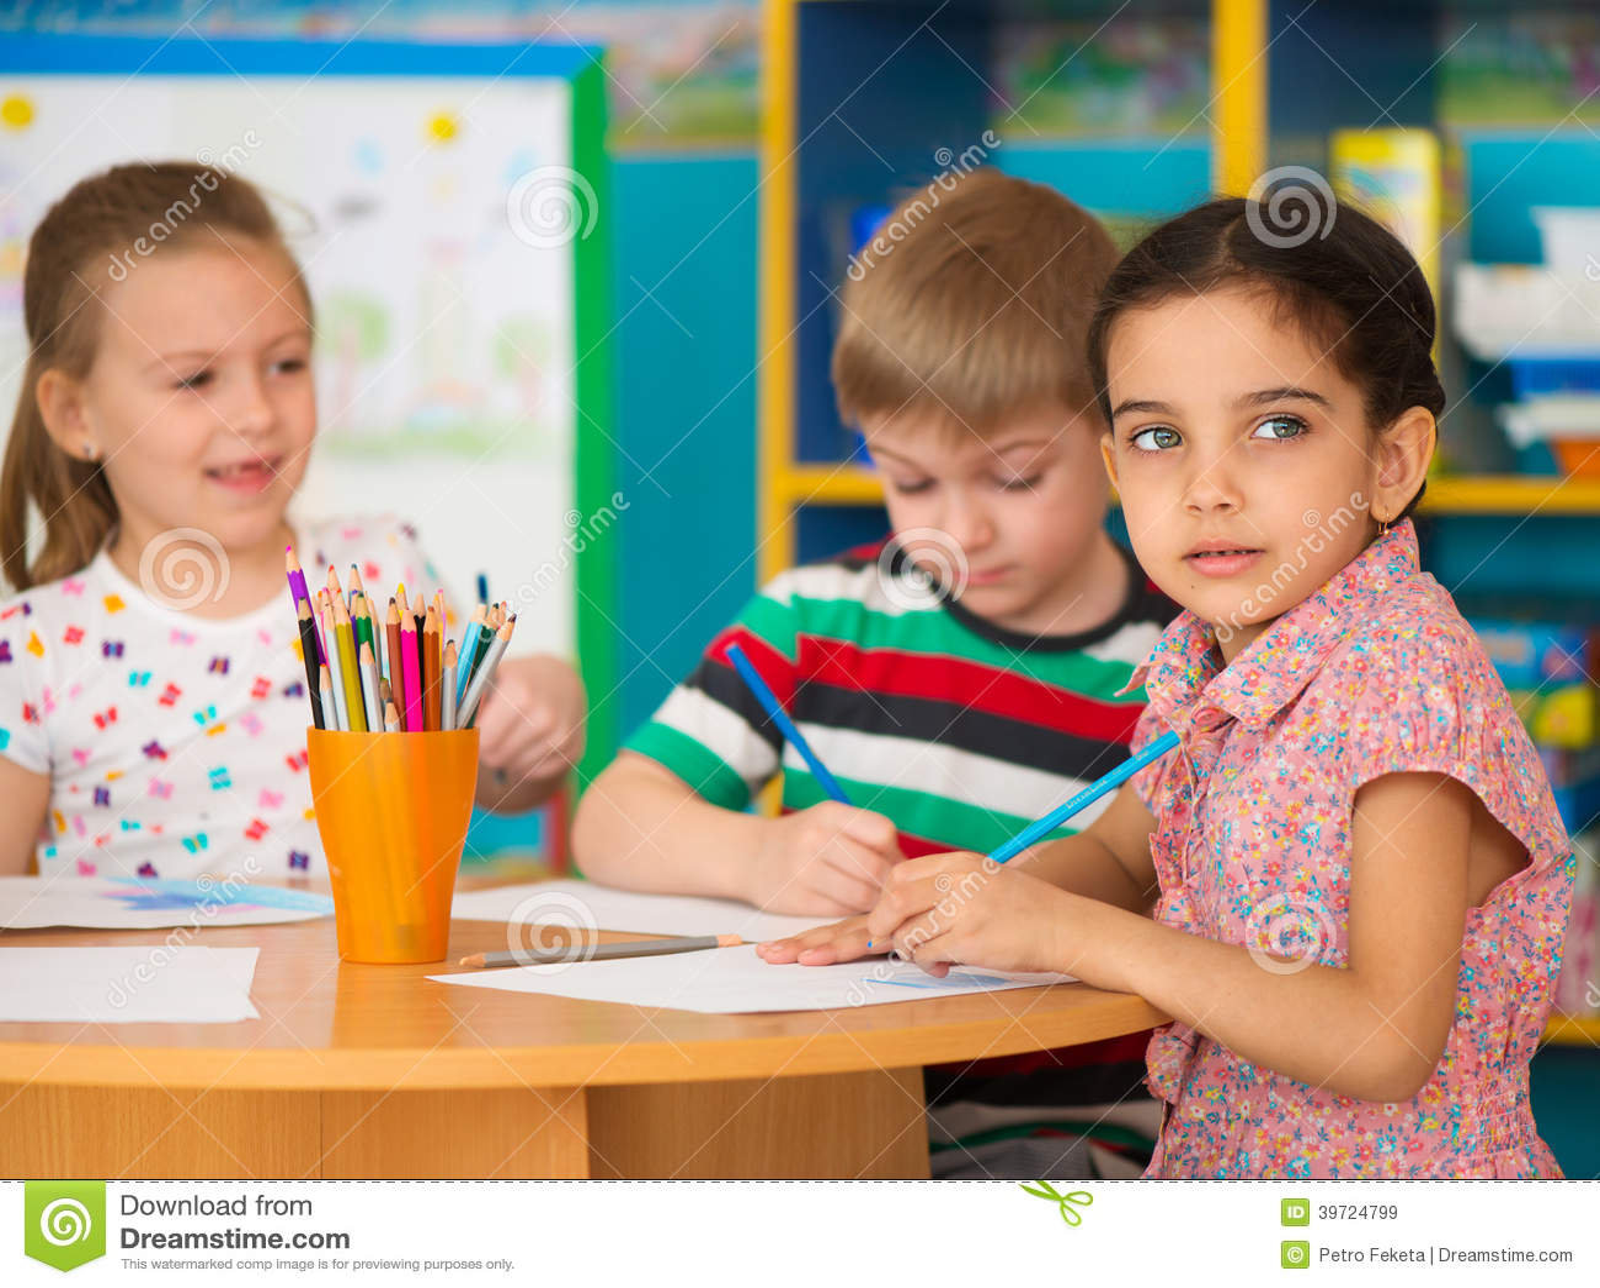 Nette Kinderstudie am Kindertagesstätte